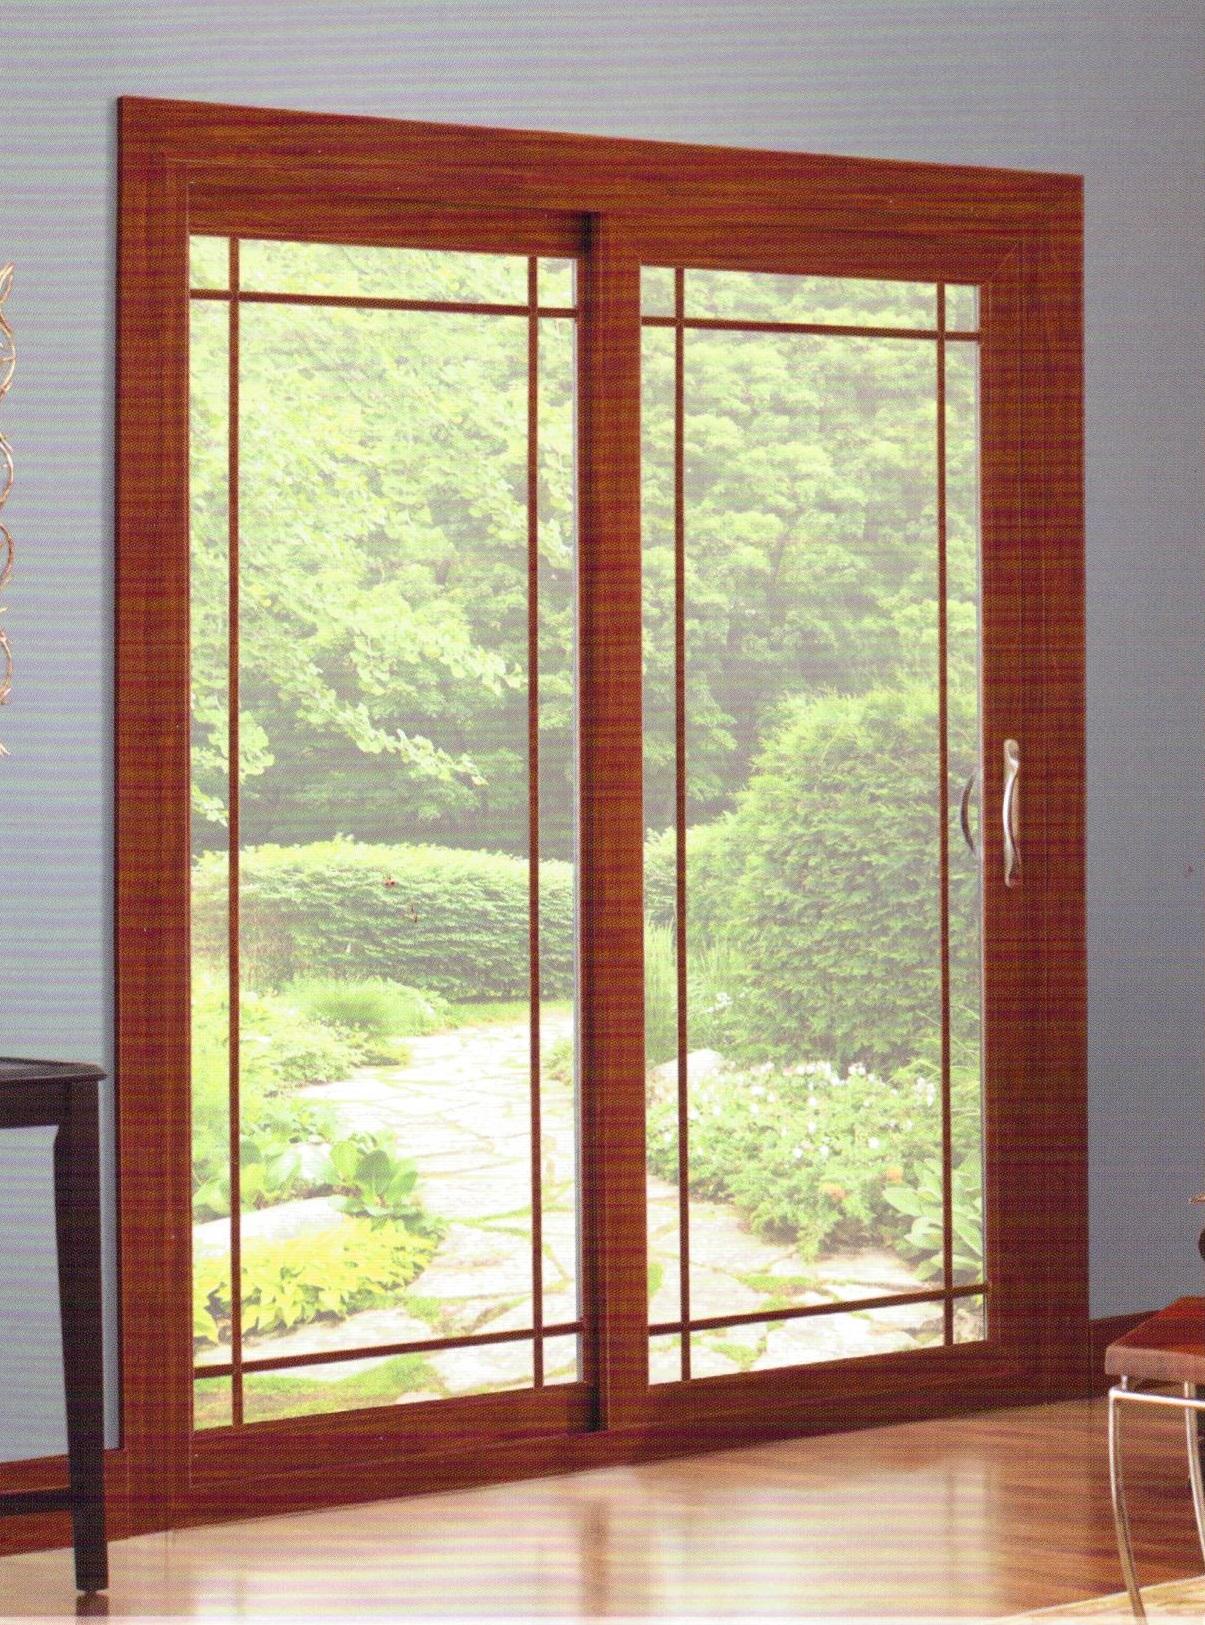 Patio doors enclosures siding carports commercial gallery for 1800 patio doors